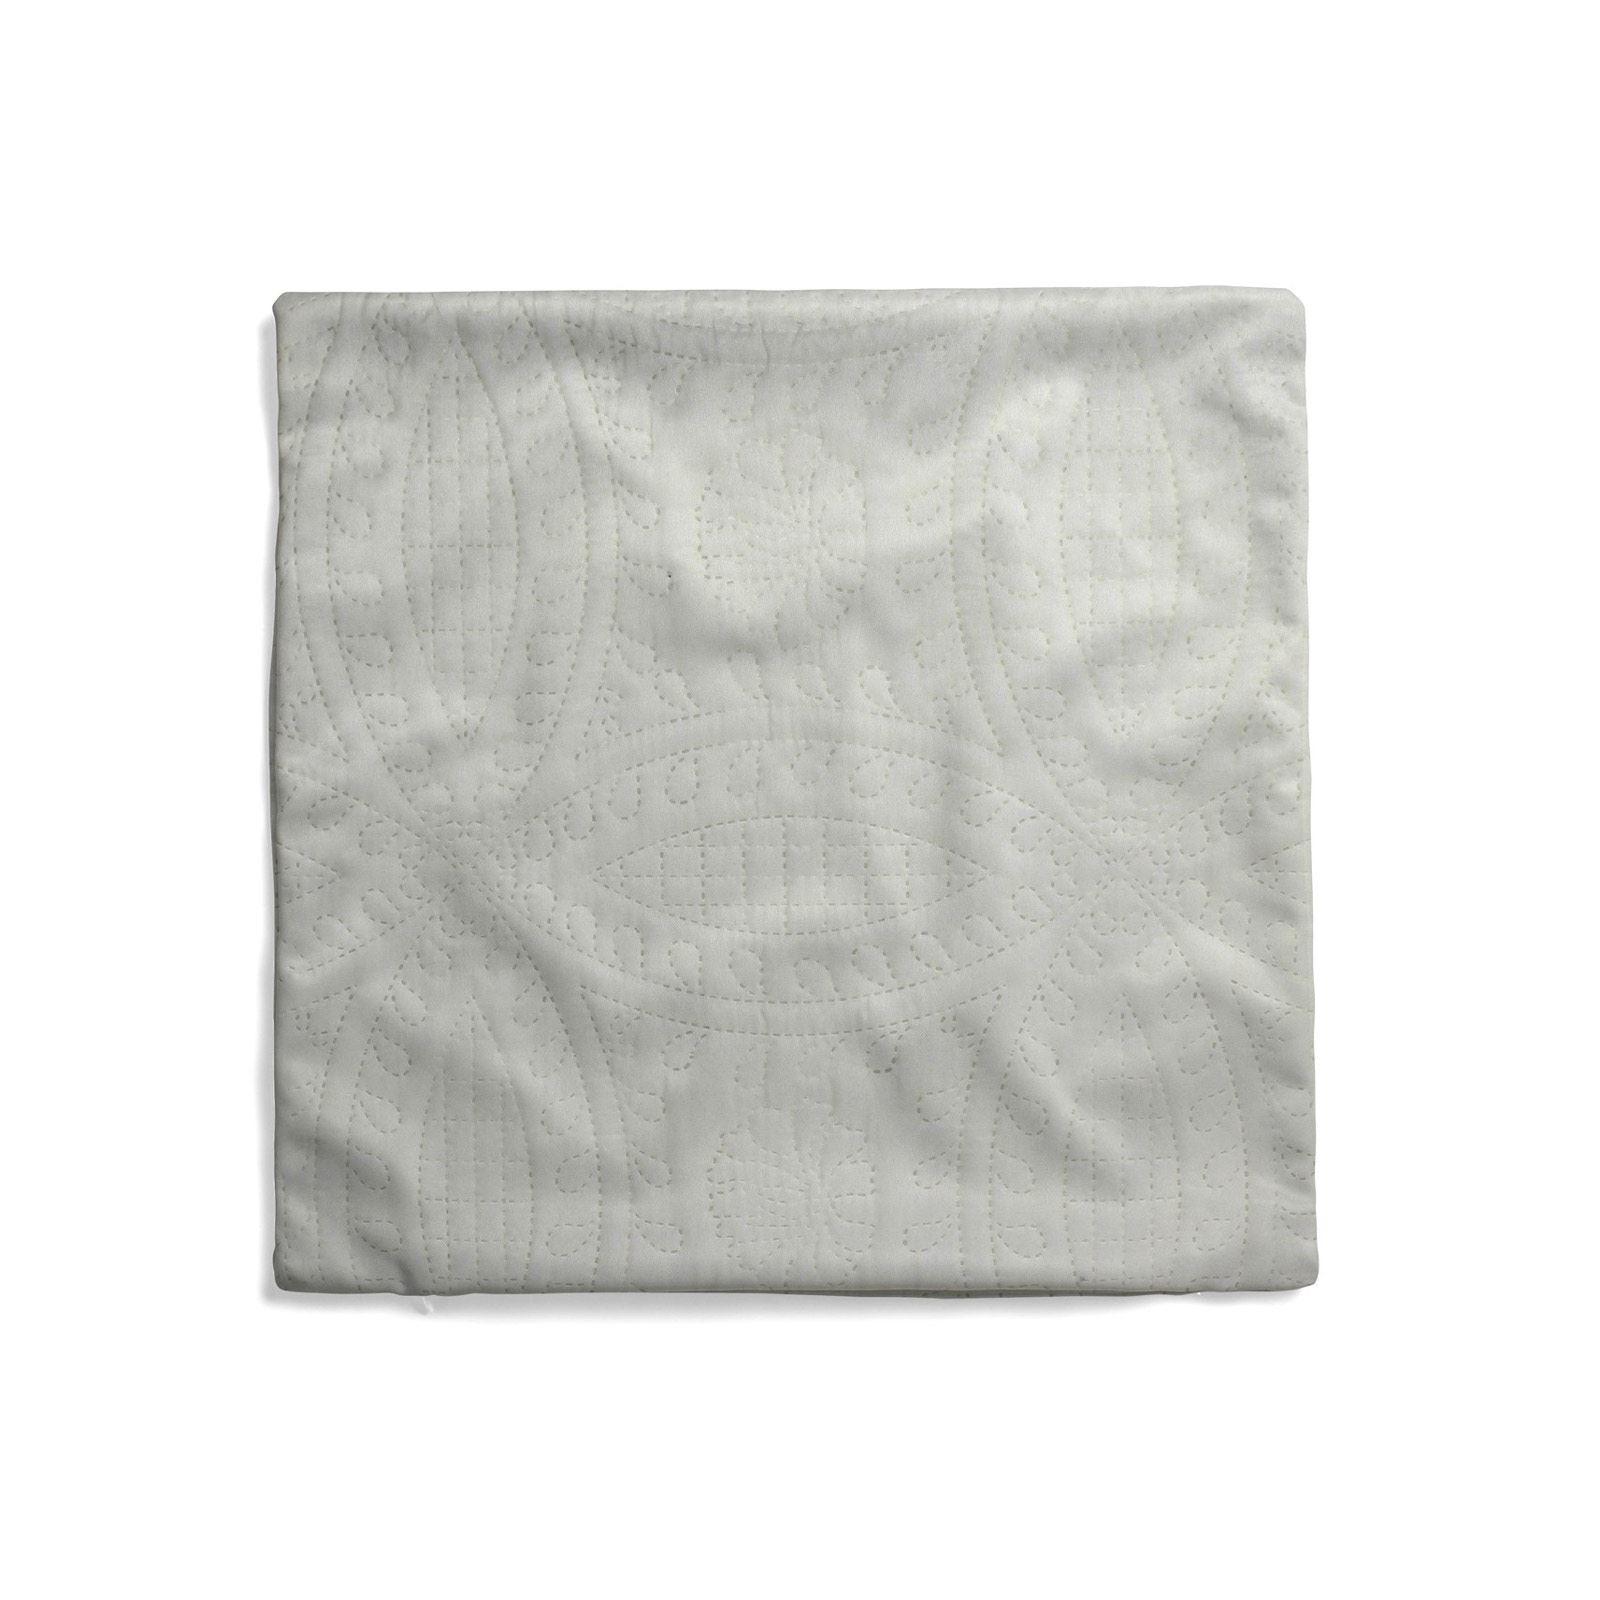 Crema-Color-Foglia-Di-Te-Blu-Uovo-D-039-anatra-Cuscino-Copre-18-034-x-18-034-45-CM-x-45-cm-COVER miniatura 28